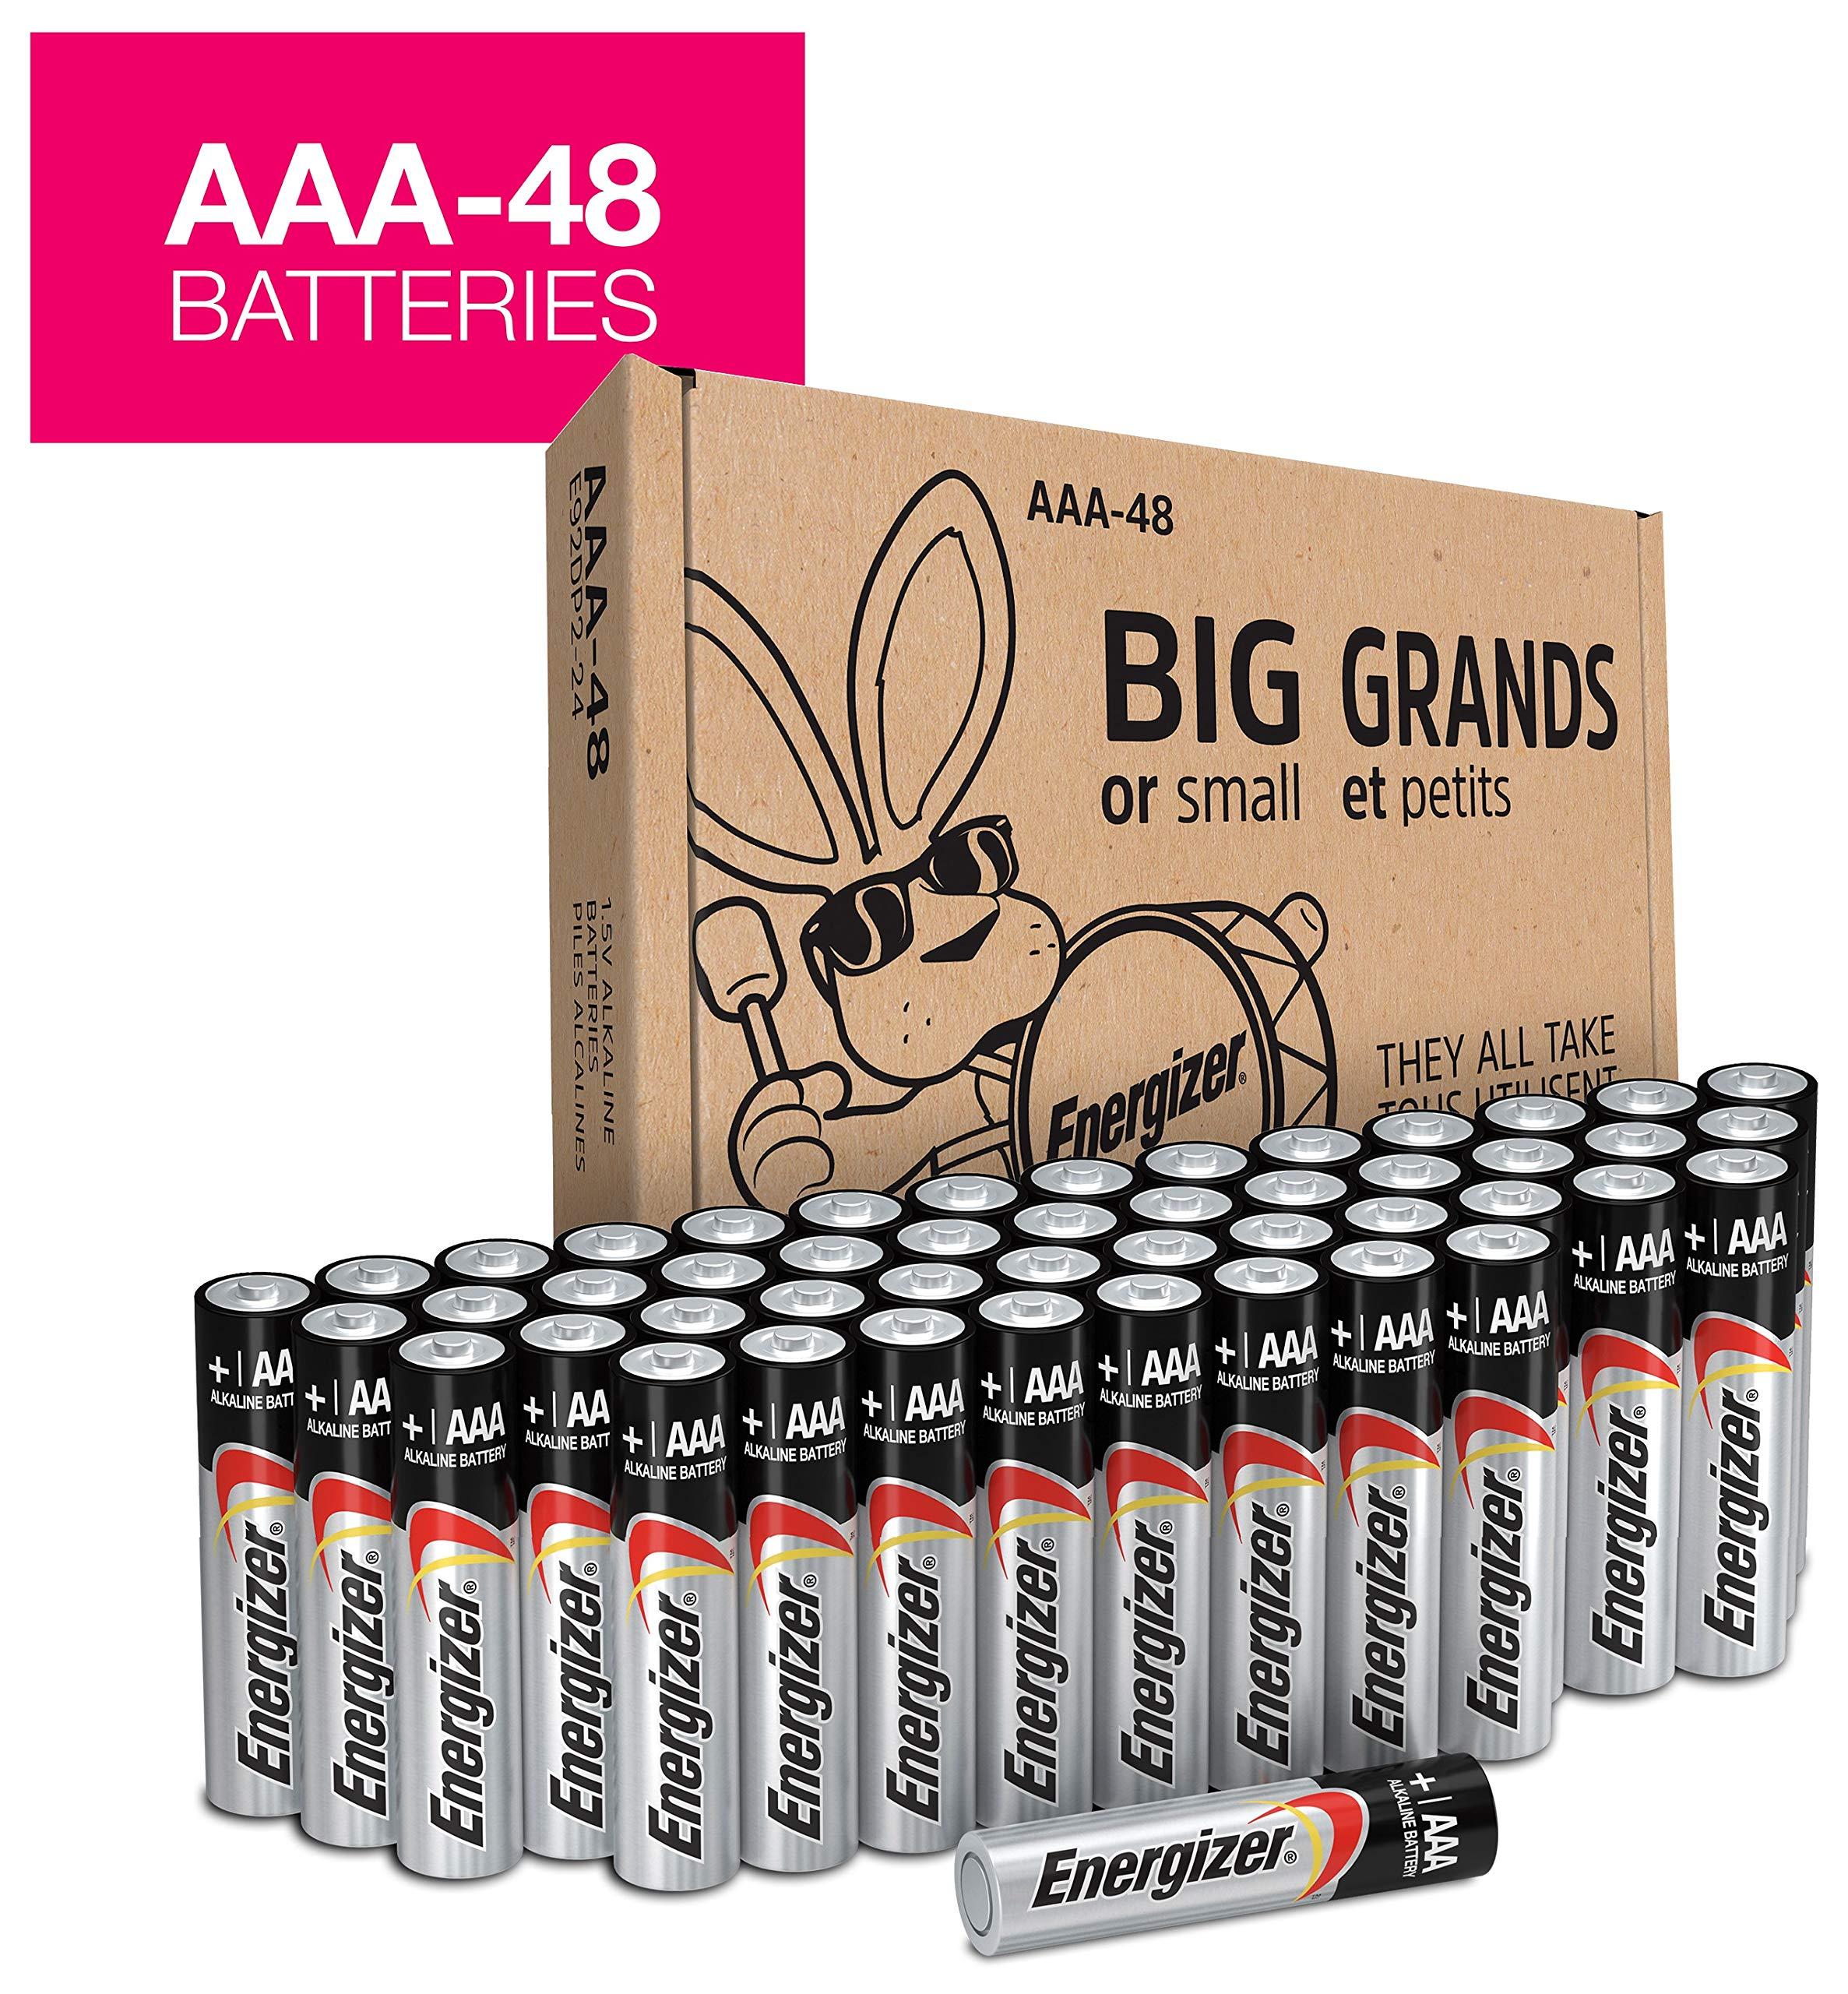 Energizer MAX Alkaline AAA Batteries, 48 Pack